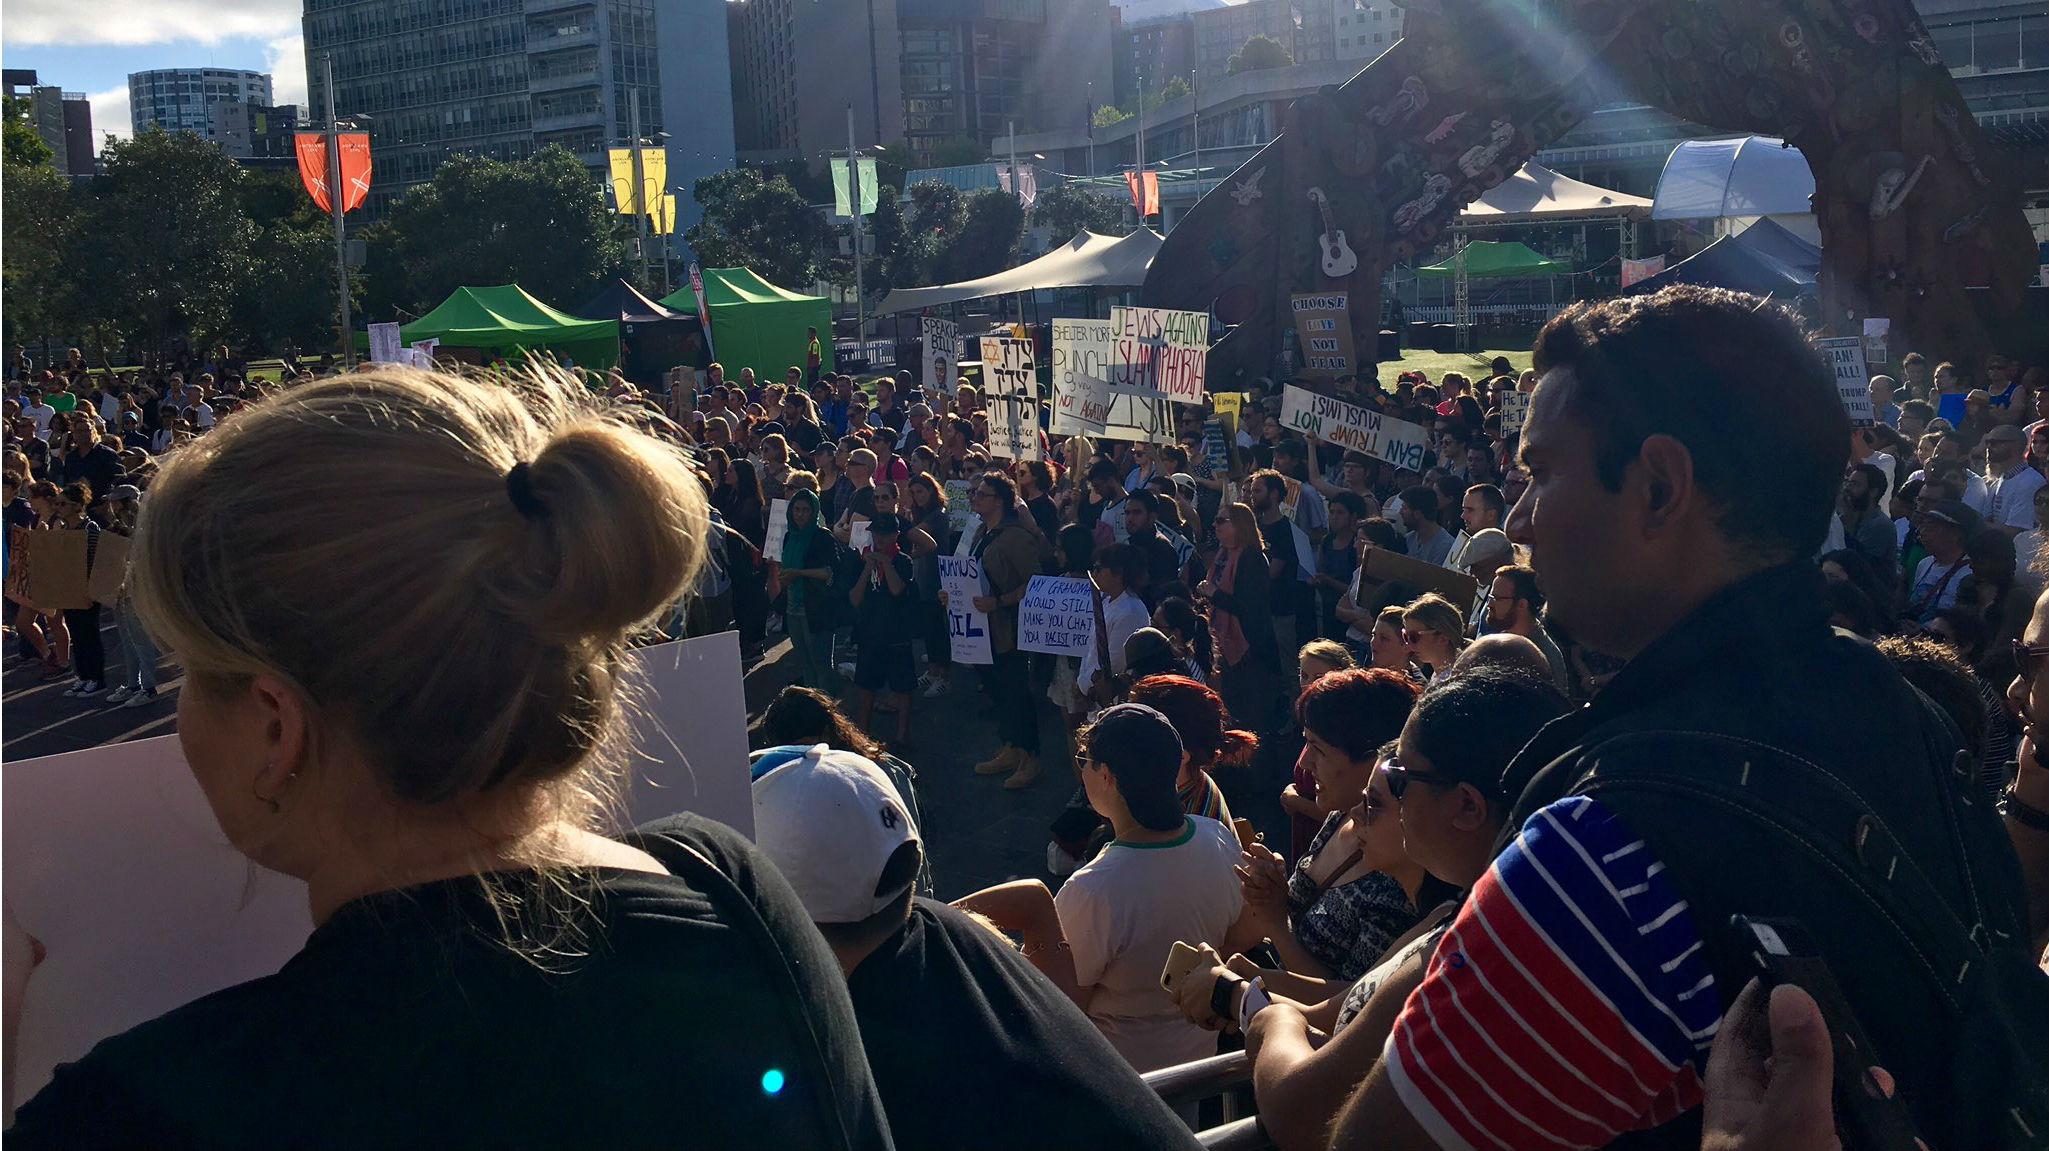 Protestors in Aotea Square (Rosie Gordon).